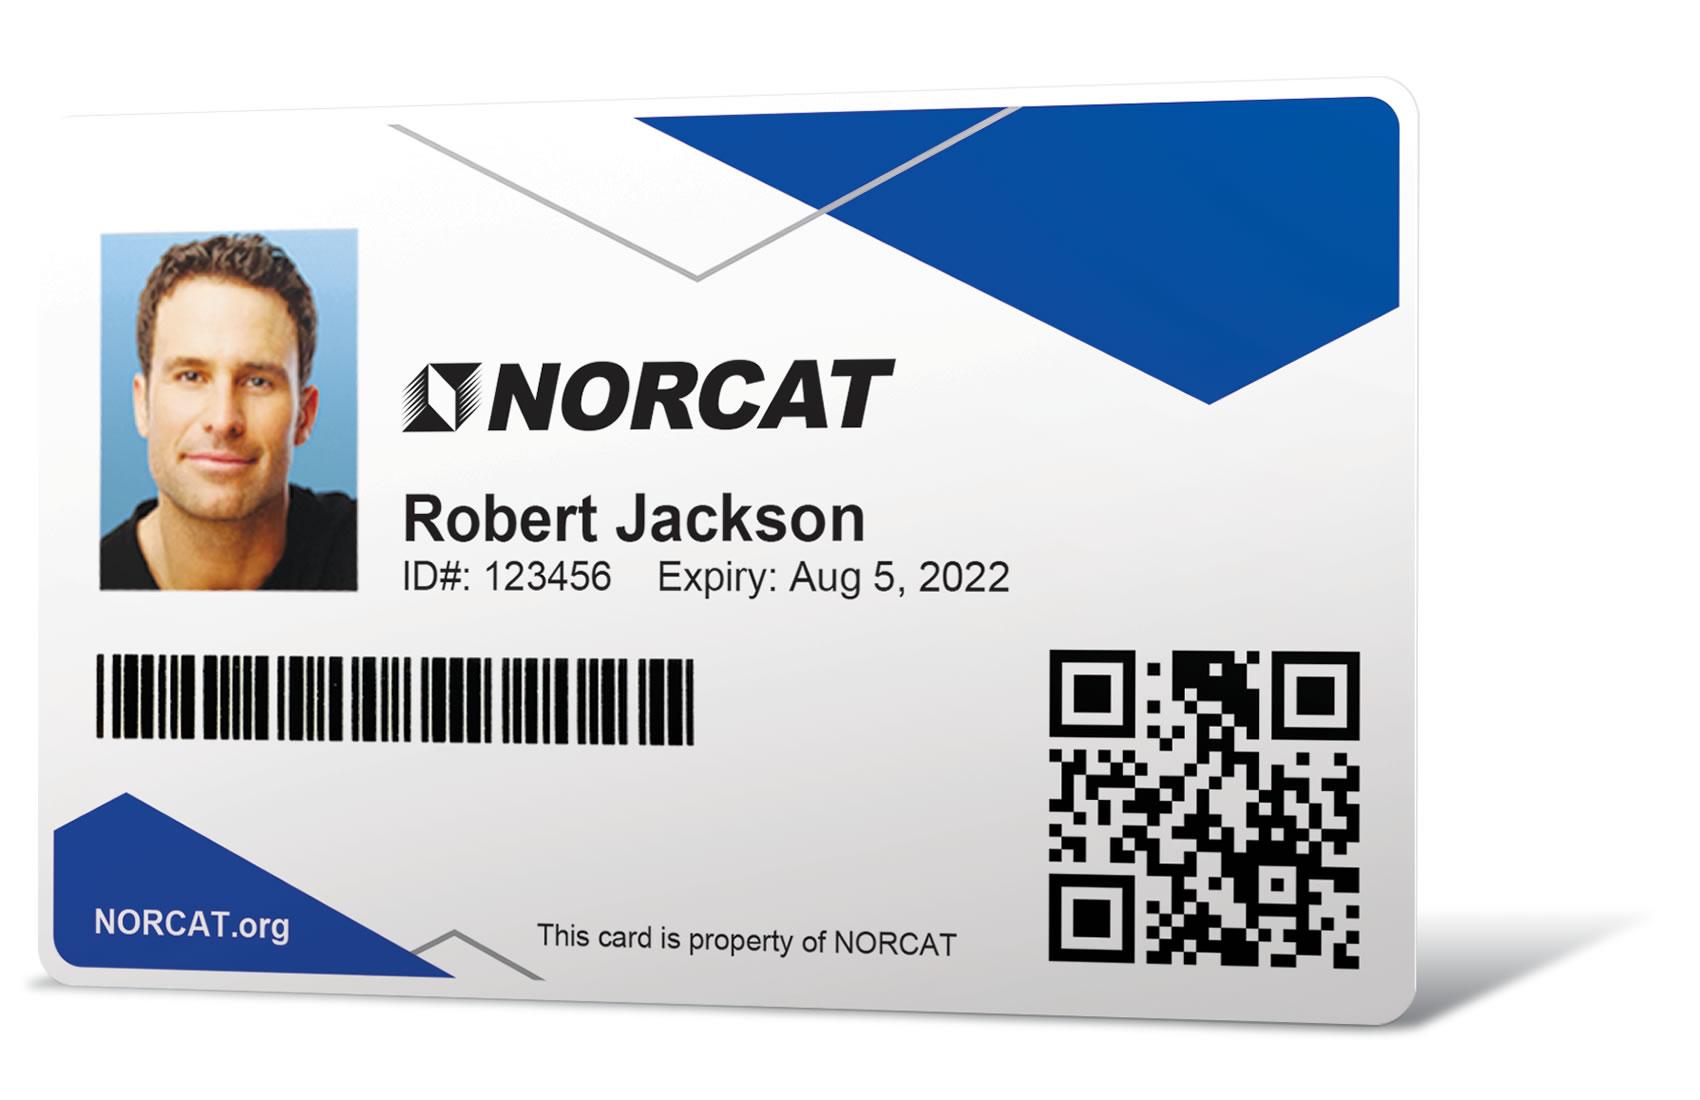 MyIBT NORCAT Card